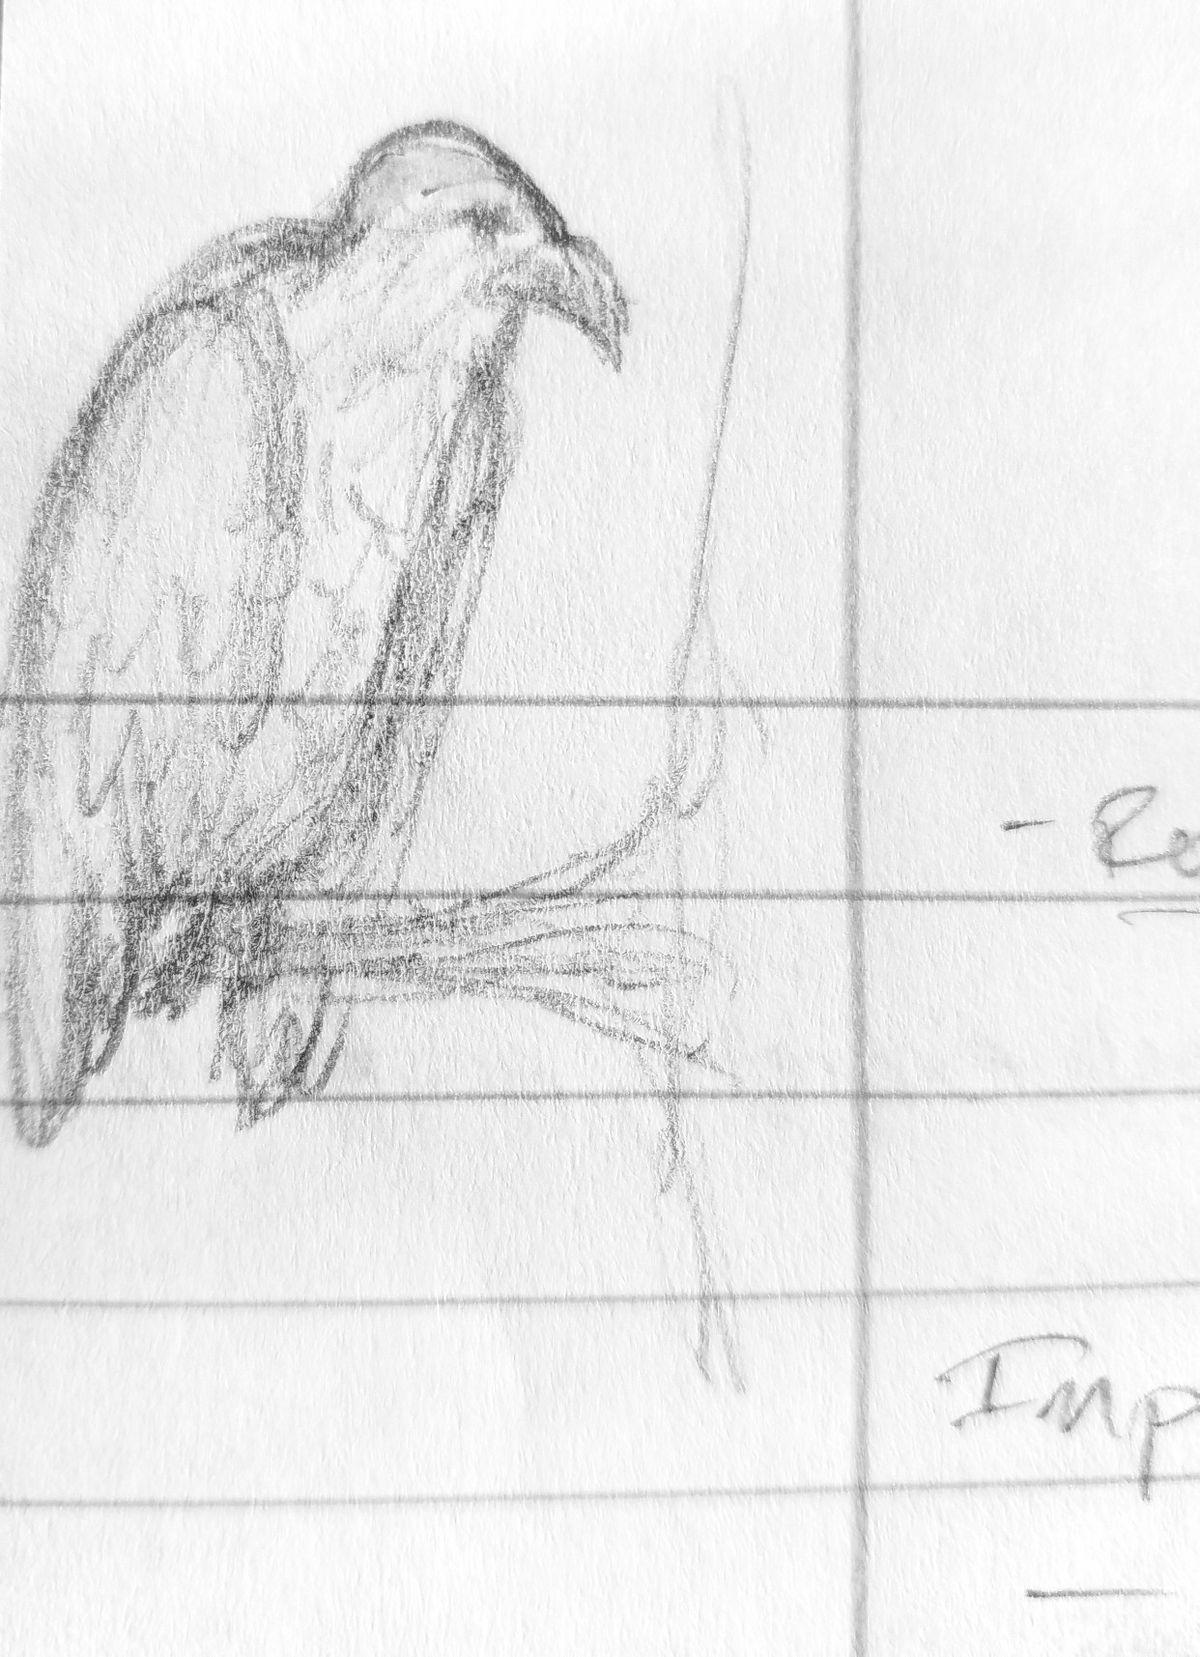 Pin by Savannah Stewart on 365 Days of Birds Art